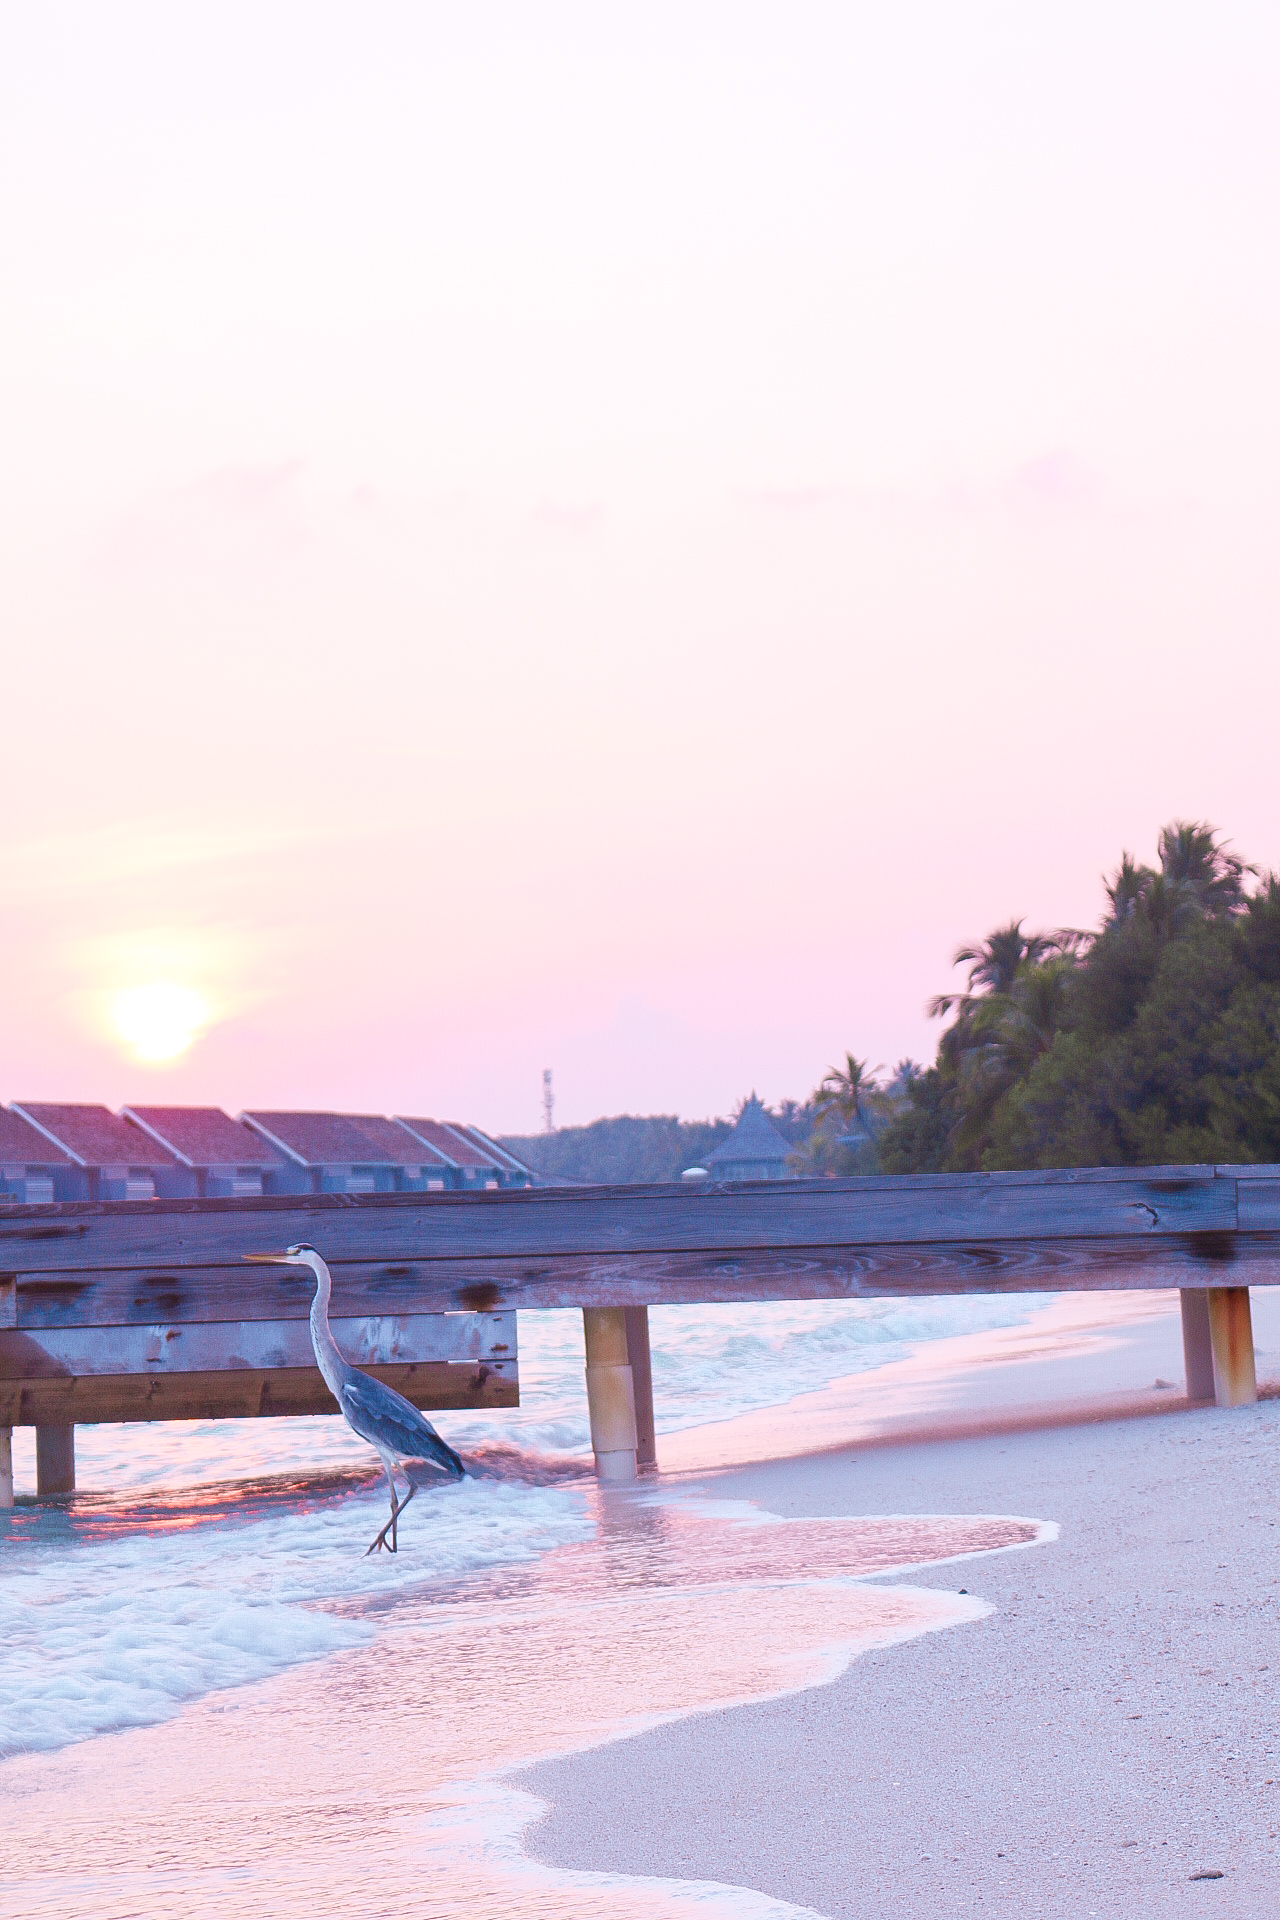 The Maldives, Maldives, Maldives honeymoon, Maldives Q&A, Maldives review, Maldives Kuramathi, Kuramathi resort, Kuramathi island, kuramathi honeymoon, dizzybrunette3 maldives